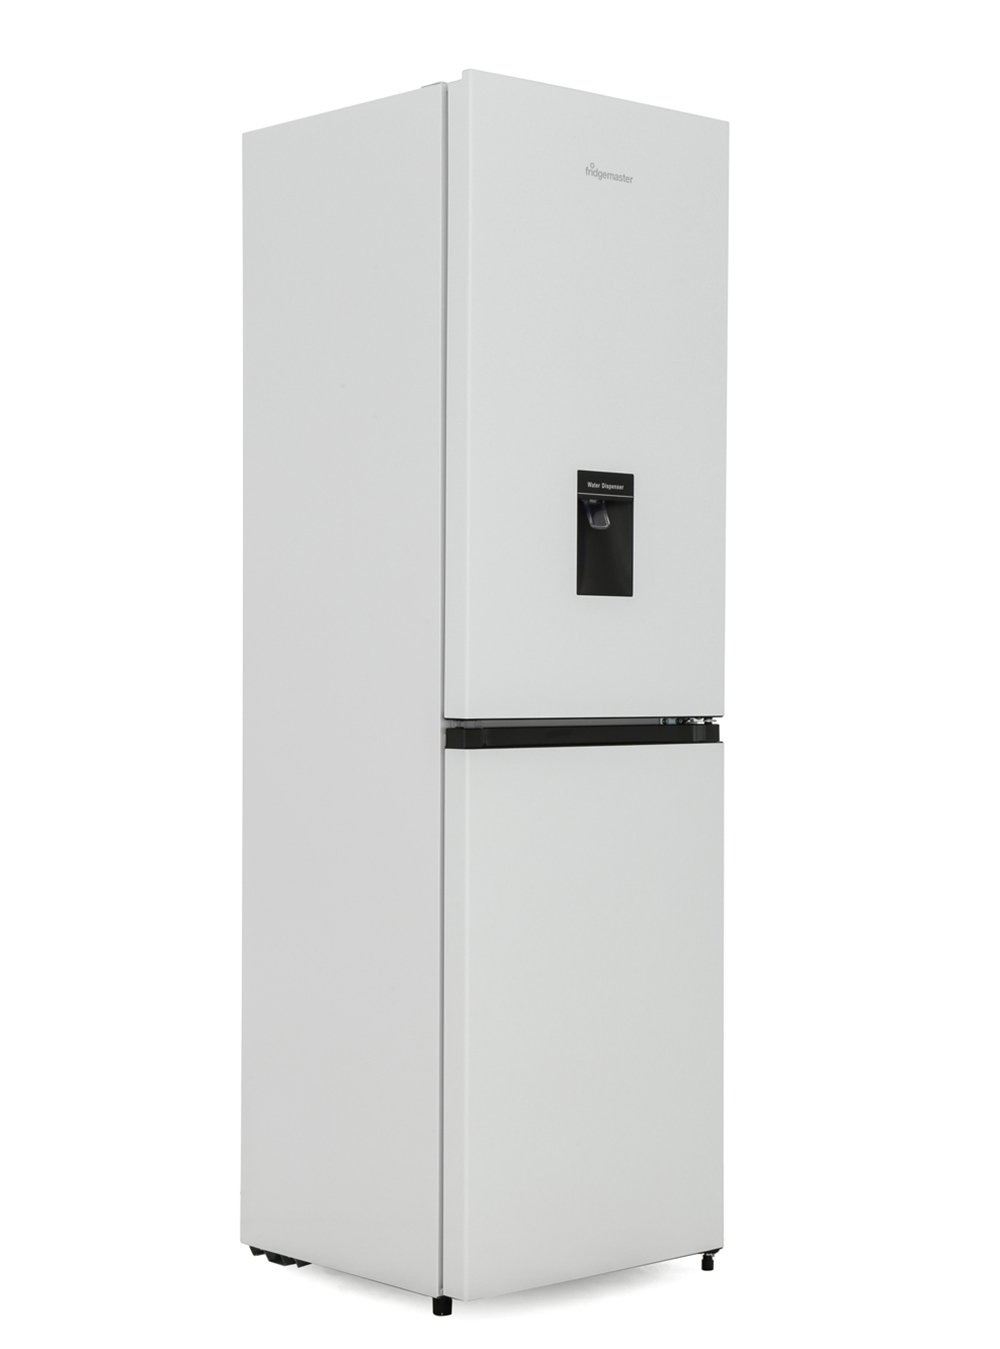 Fridgemaster MC55251MD Frost Free Fridge Freezer